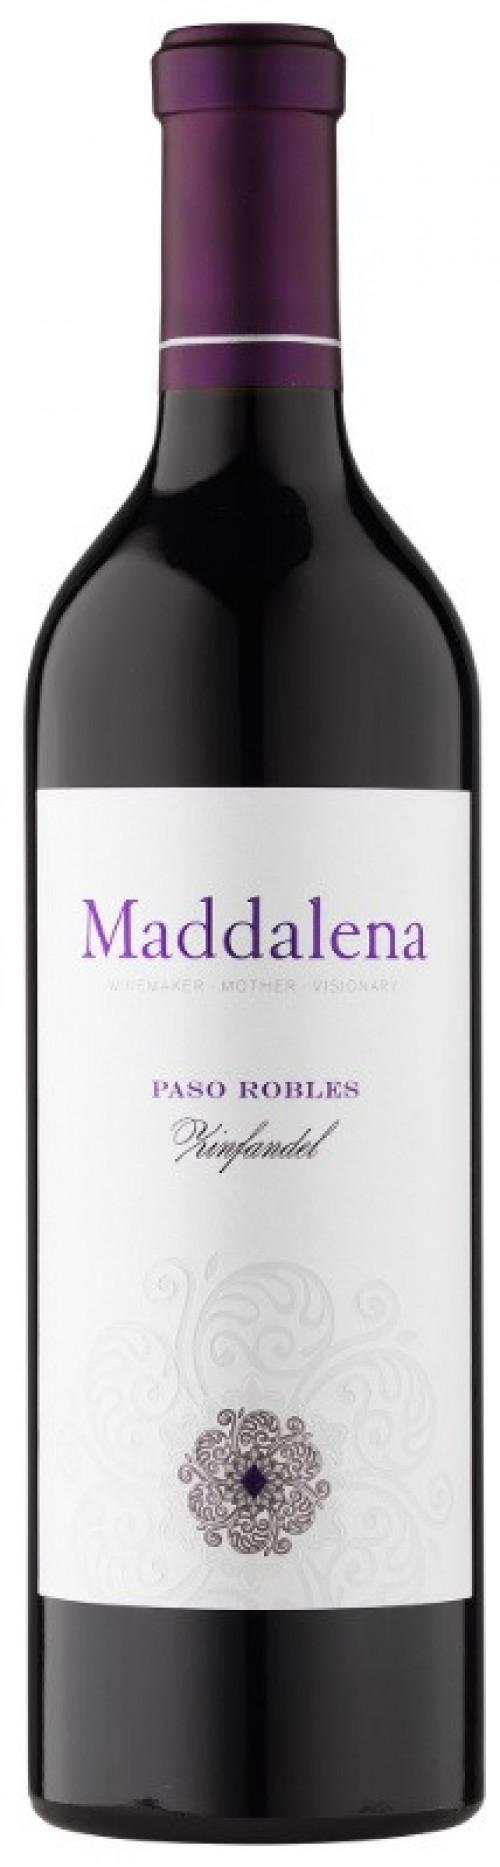 2016 Maddalena Paso Robles Zinfandel 750ml